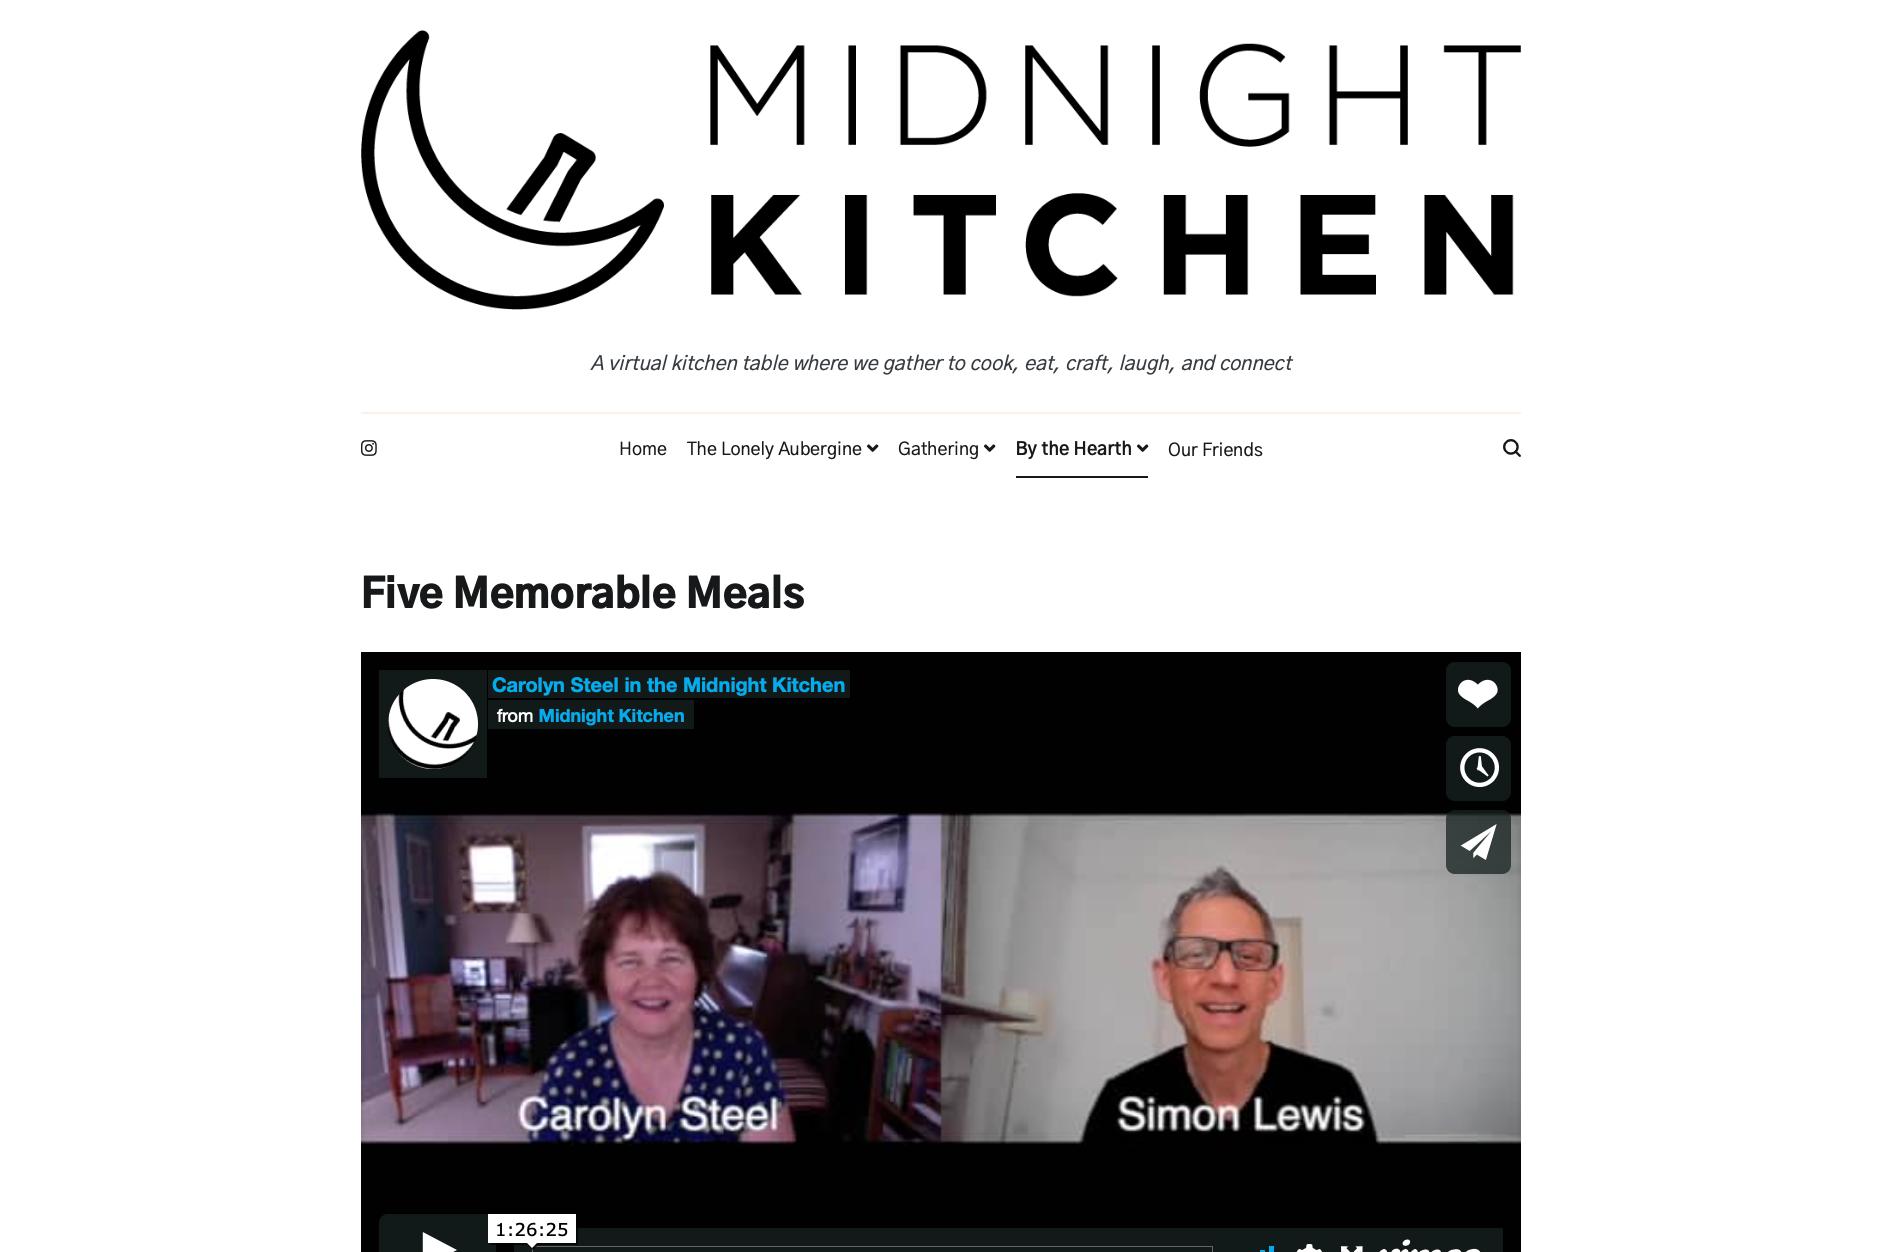 Midnight Kitchen: Five Memorable Meals